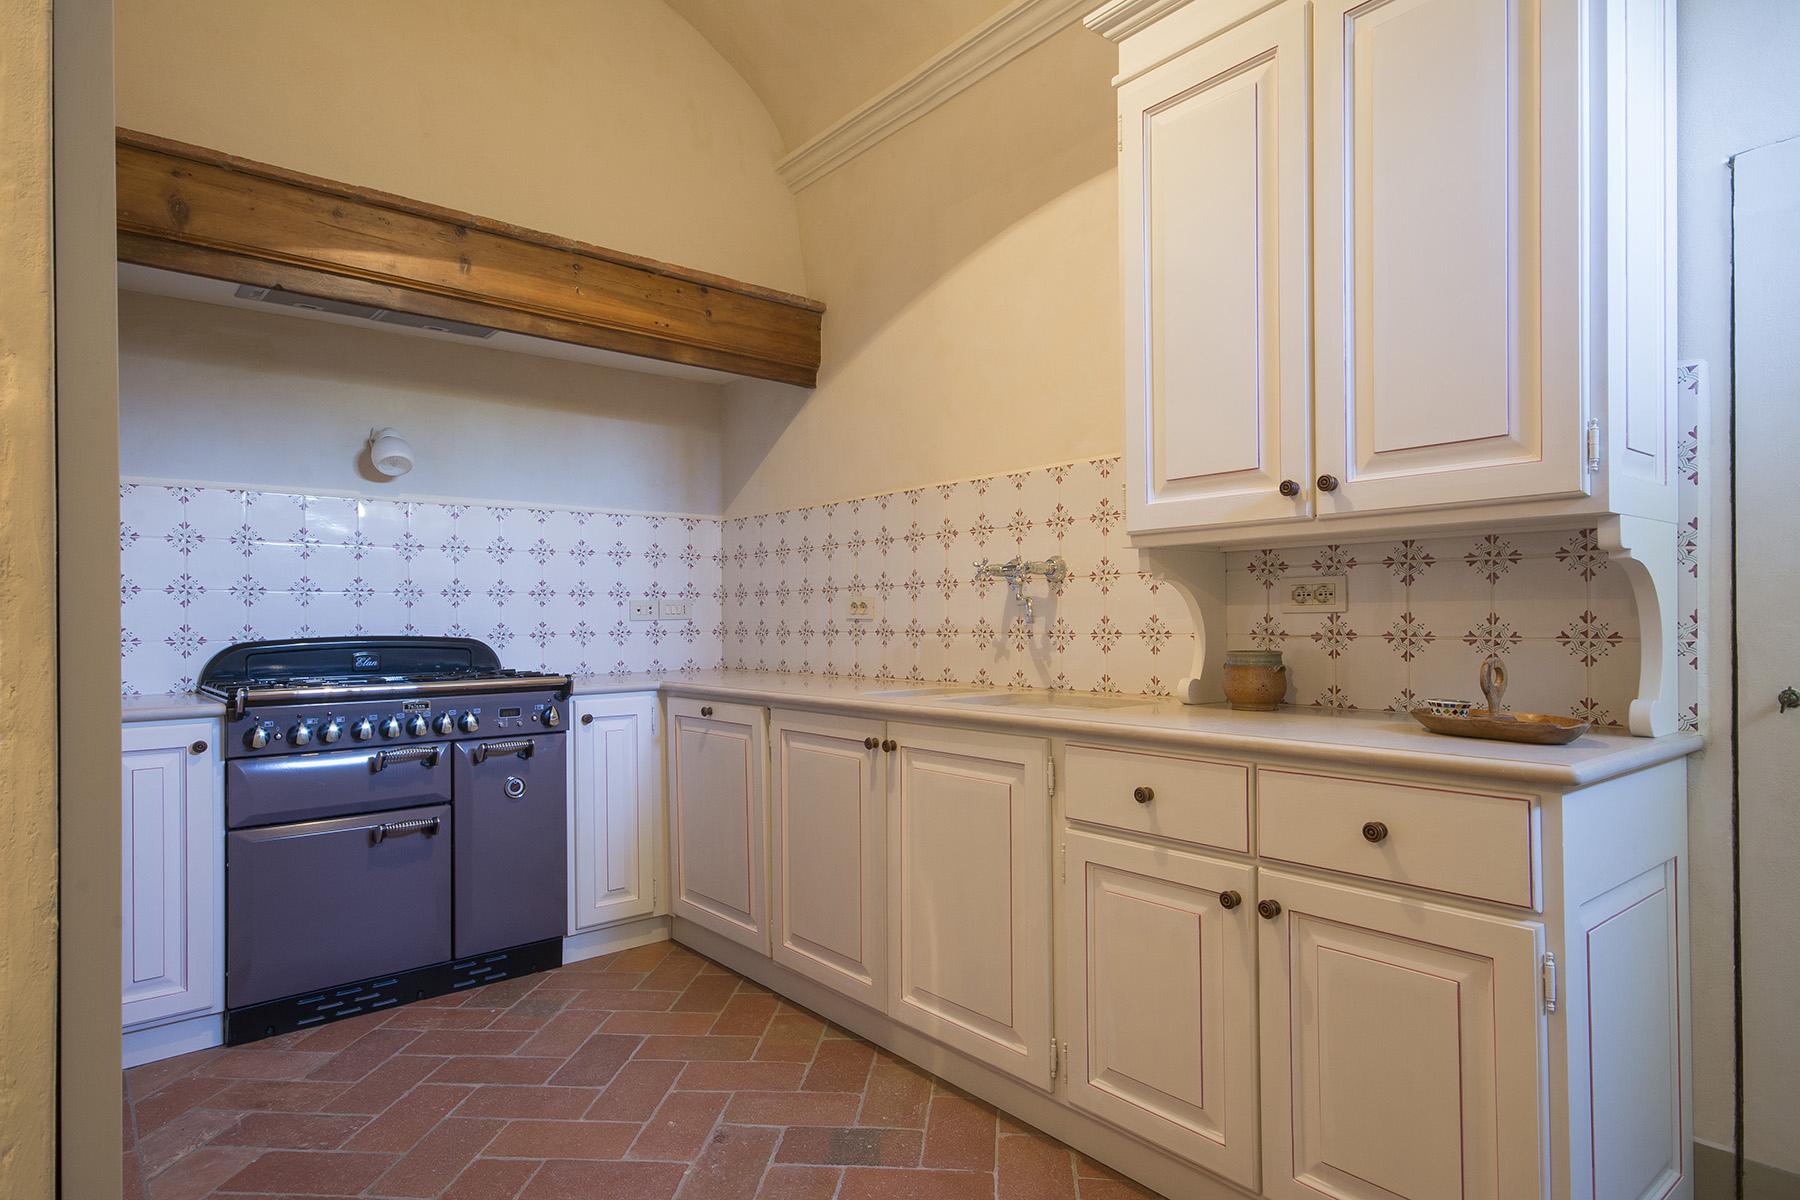 Villa in Affitto a Impruneta: 5 locali, 560 mq - Foto 6